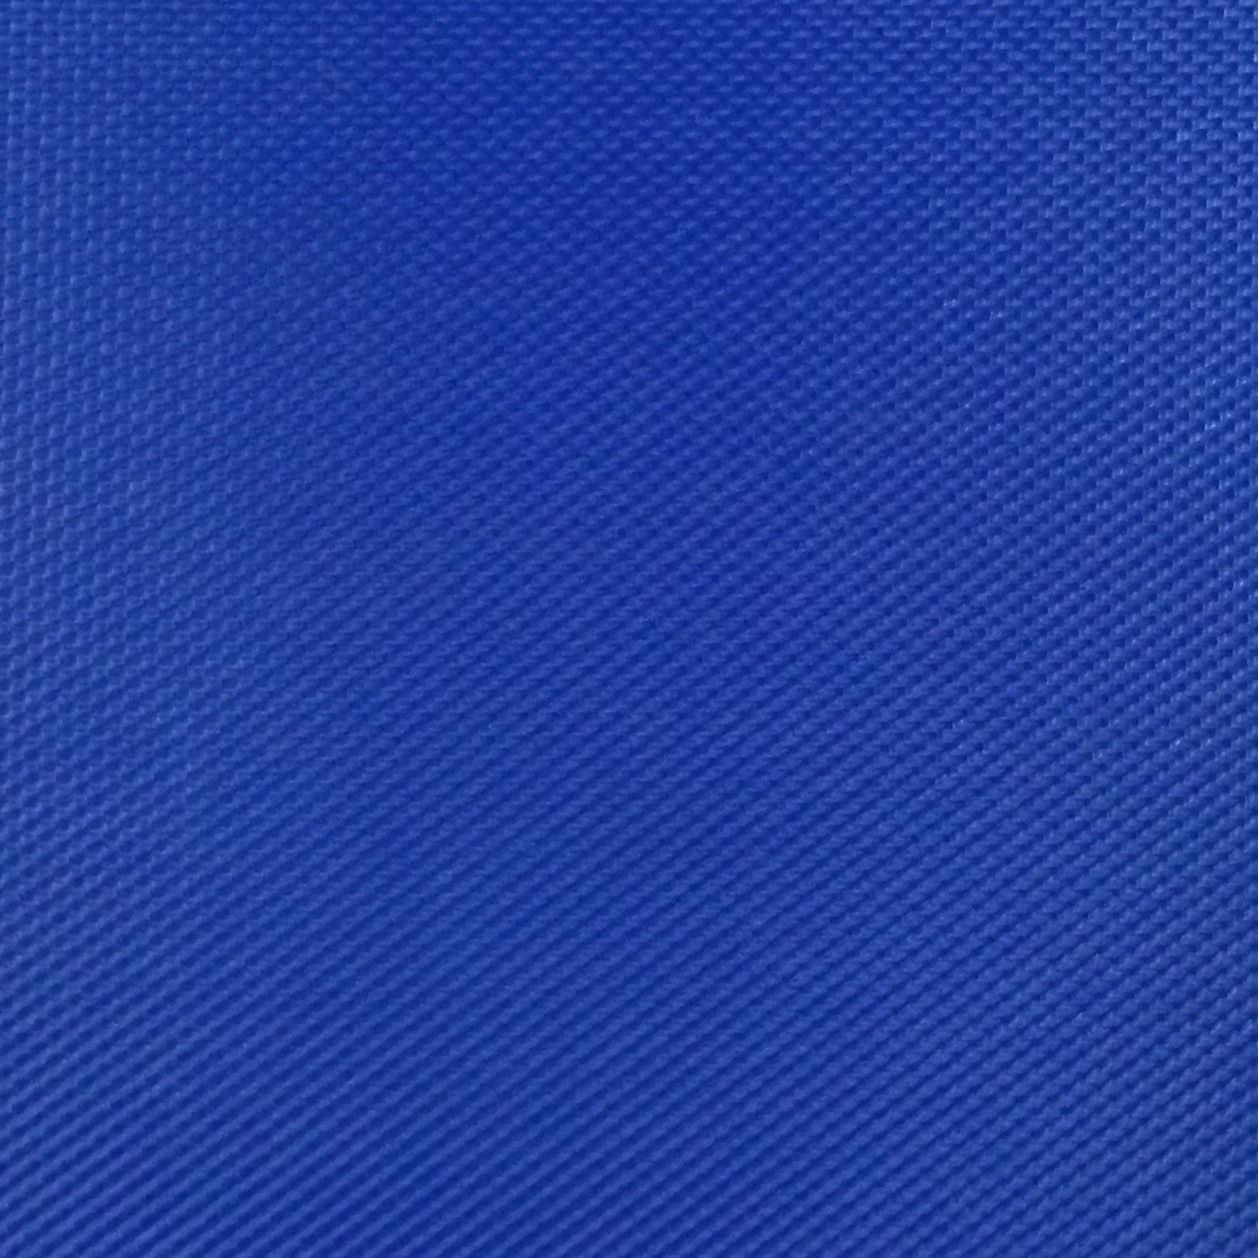 Low Density Blue